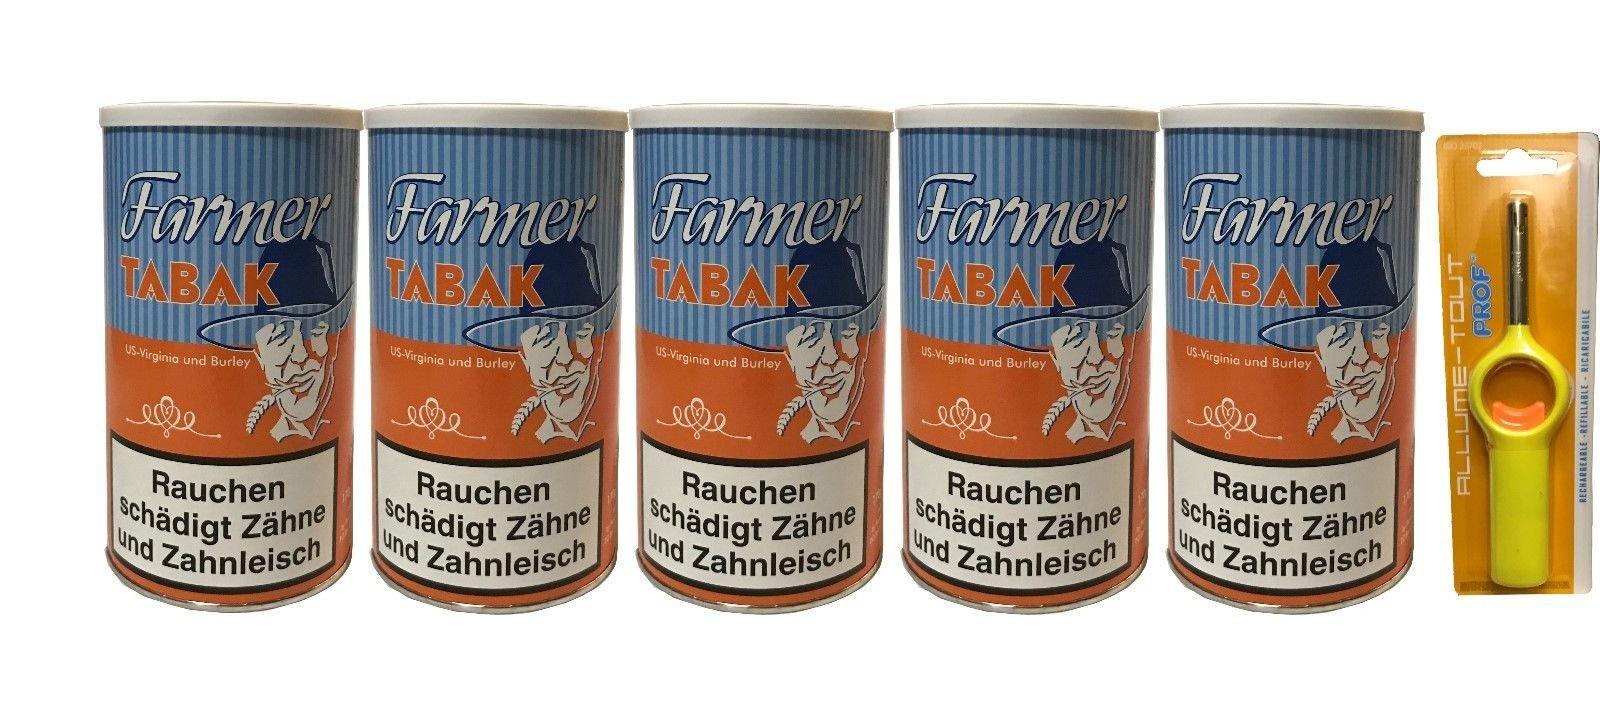 5x Dosen Farmer Tabak / Pfeifentabak á 170 g + Stabfeuerzeug